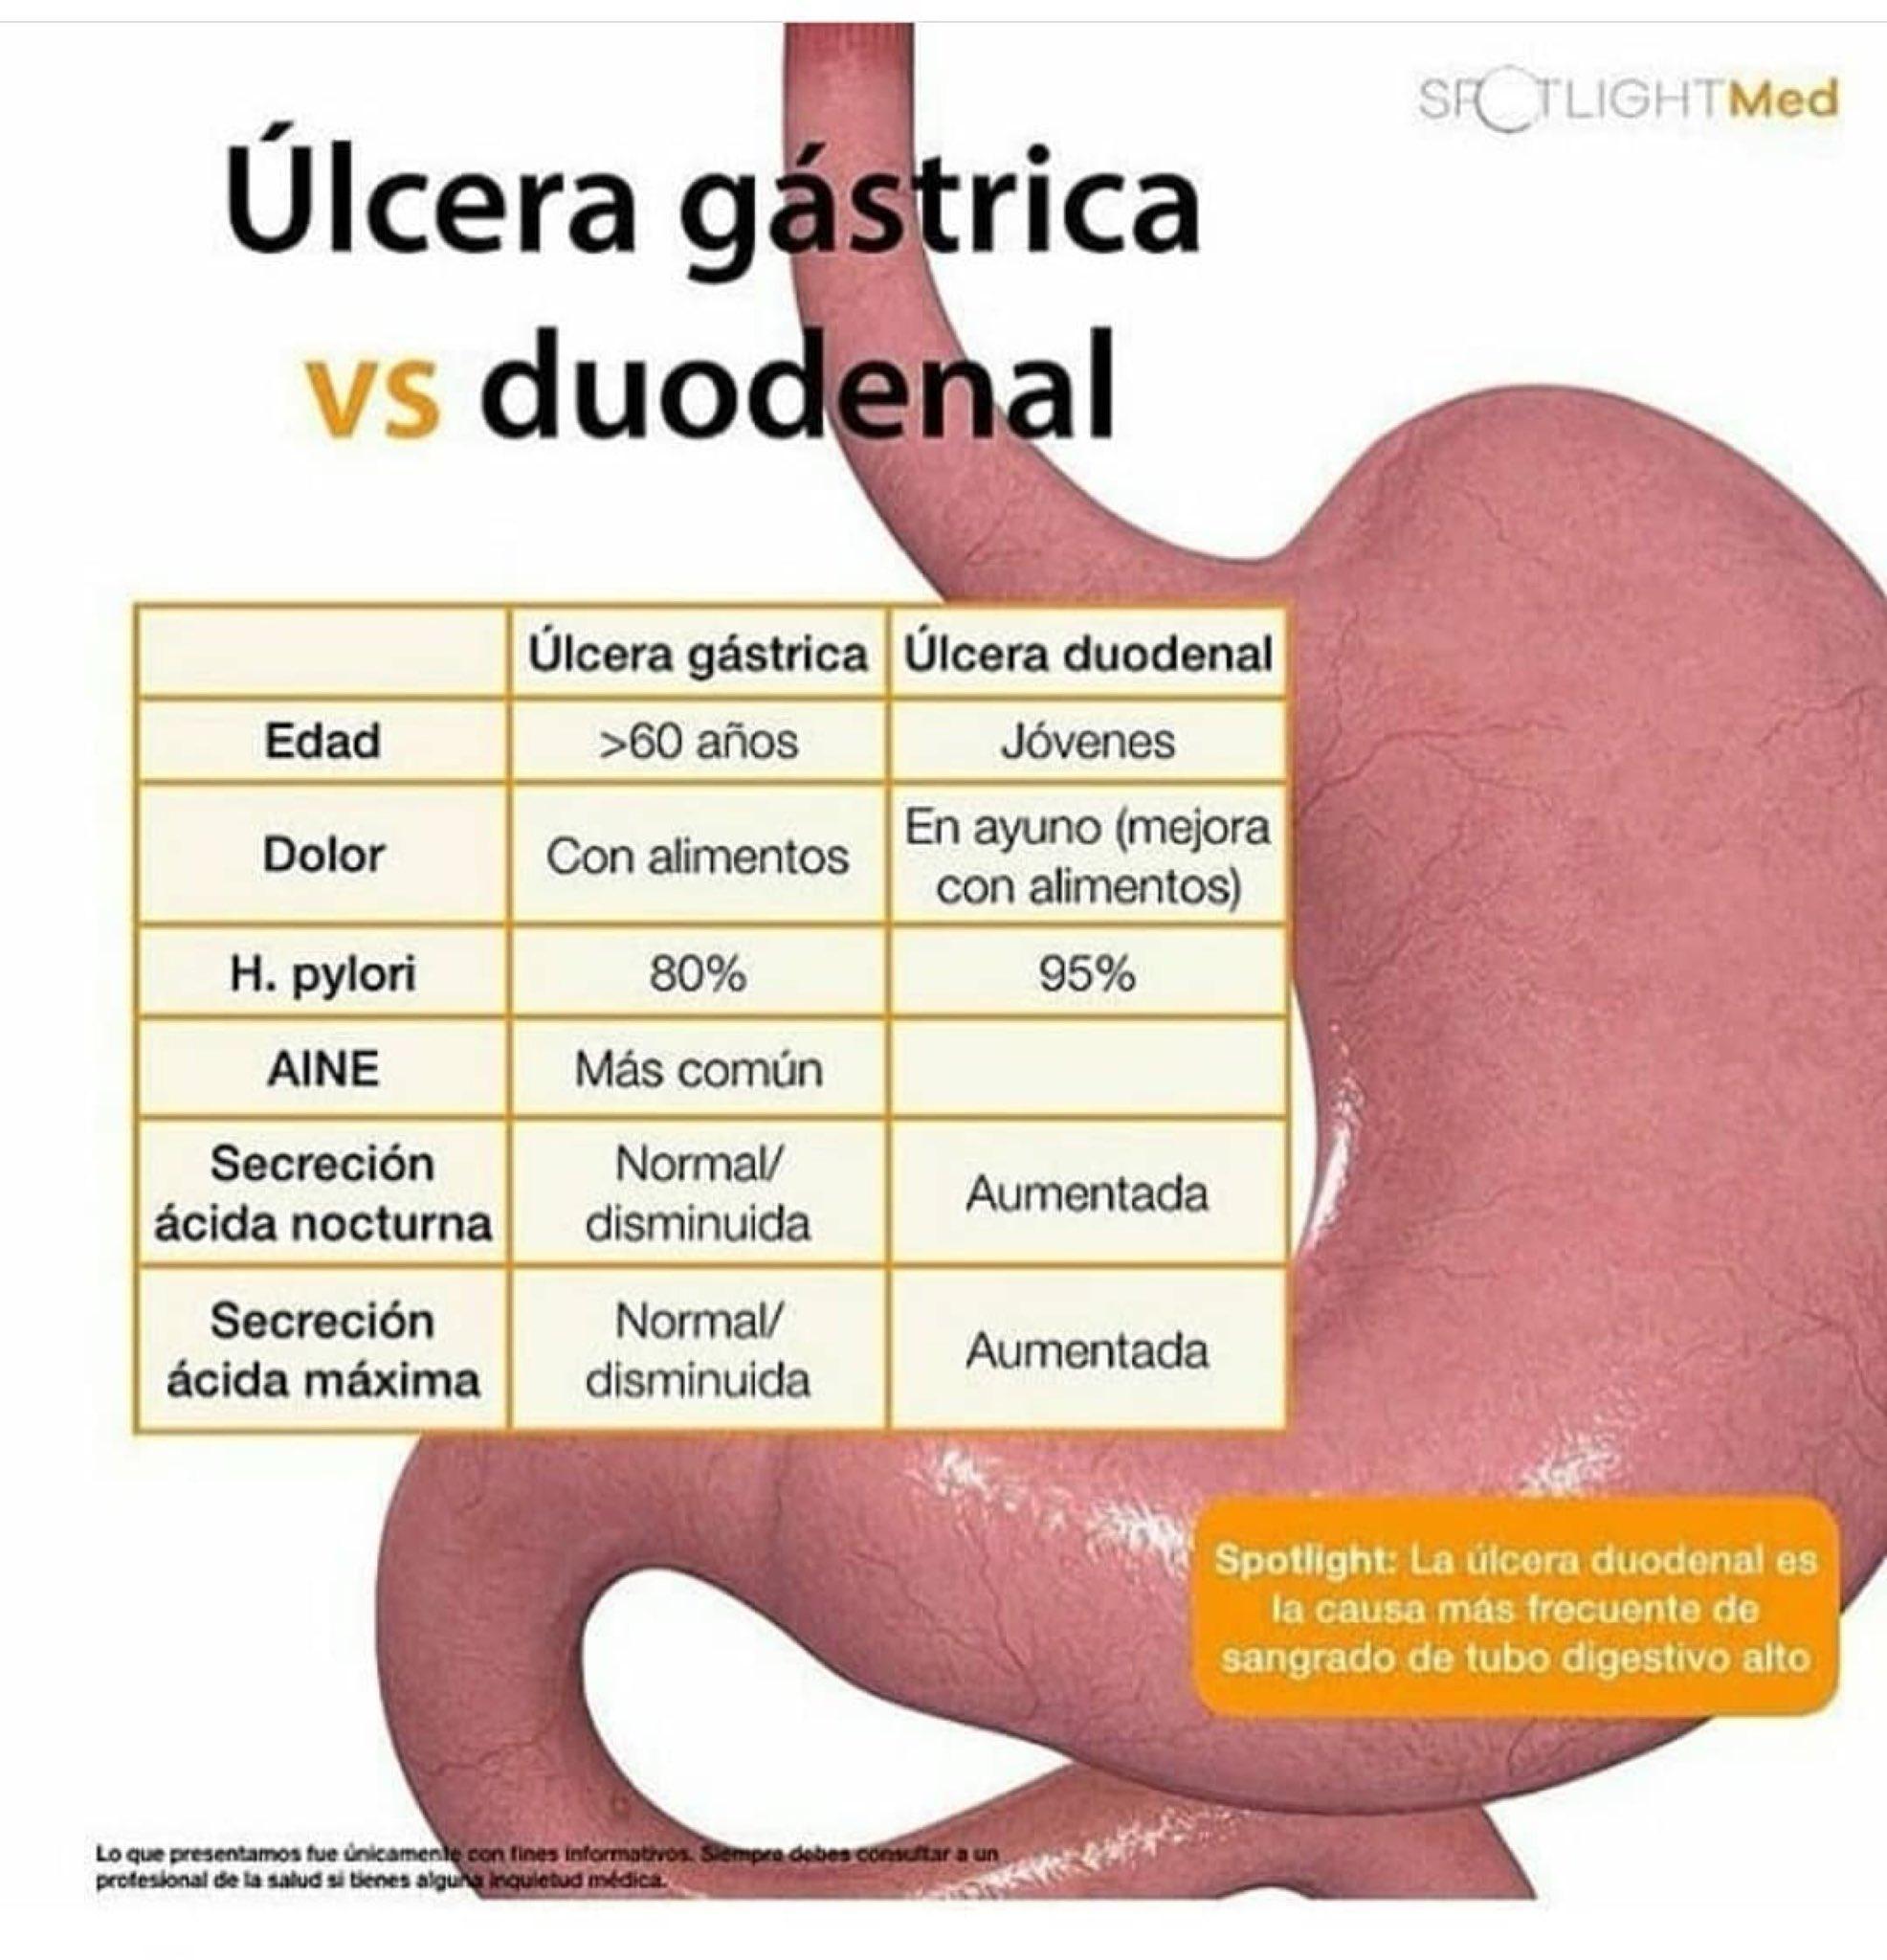 Úlcera gástrica vs duodenal para tener en claro bien las diferencias. https://t.co/LIJfMbhuif